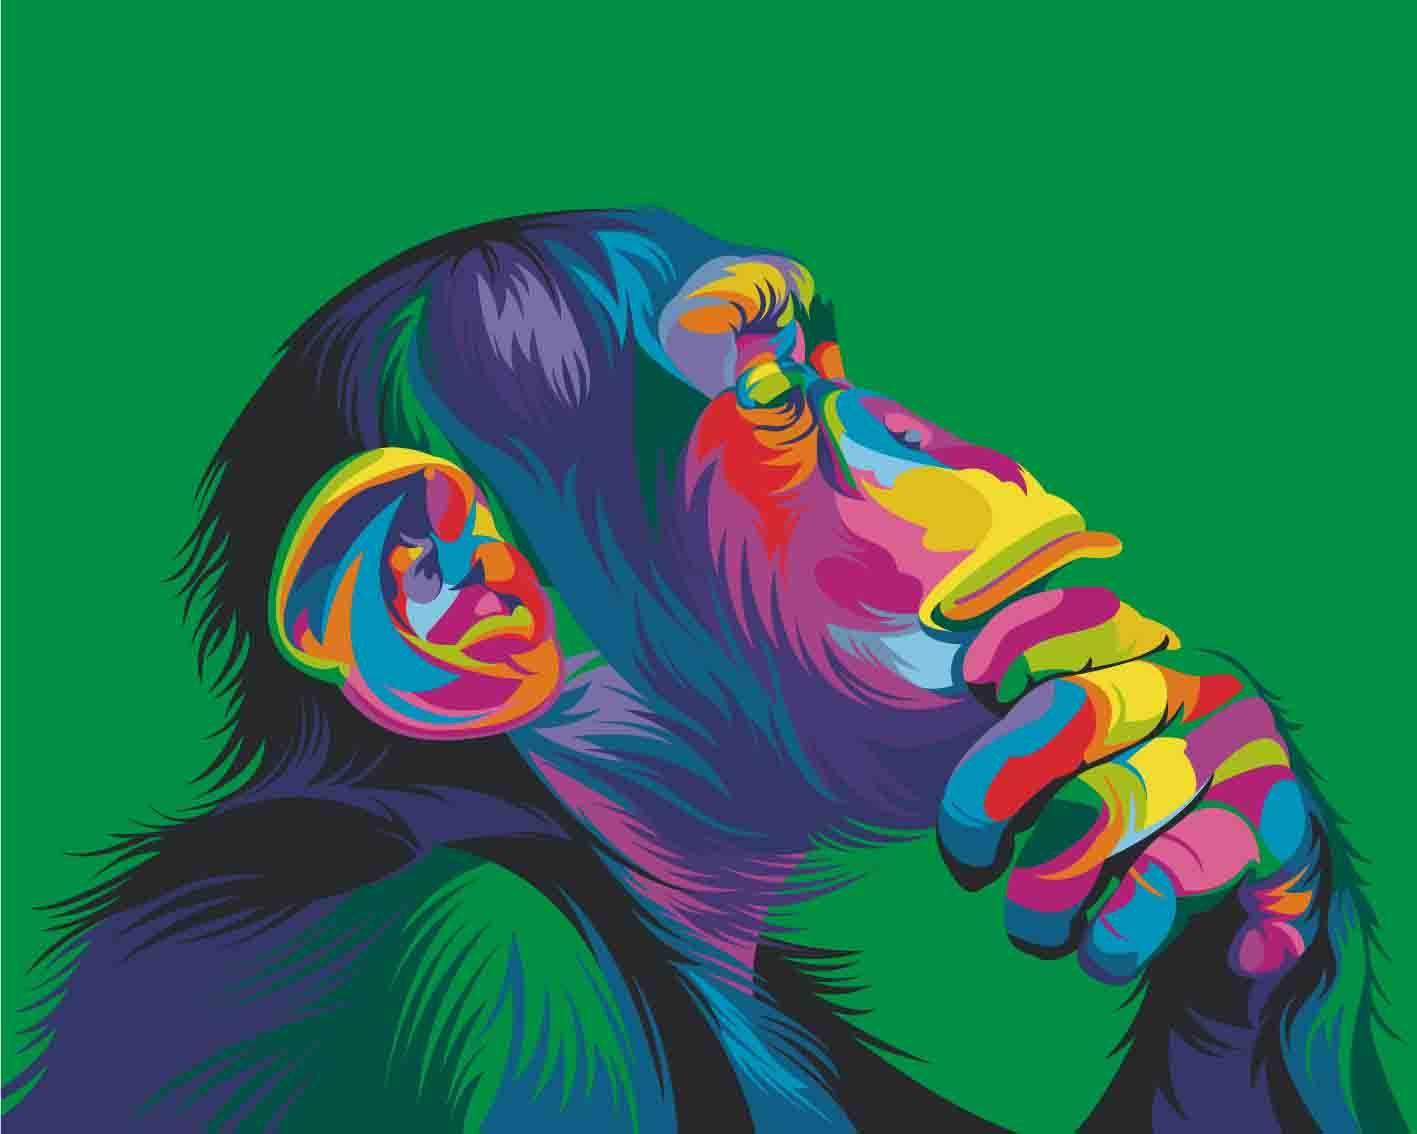 Картина по номерам Артвентура «Радужная обезьяна» Ваю Ромдони 02ART40500018